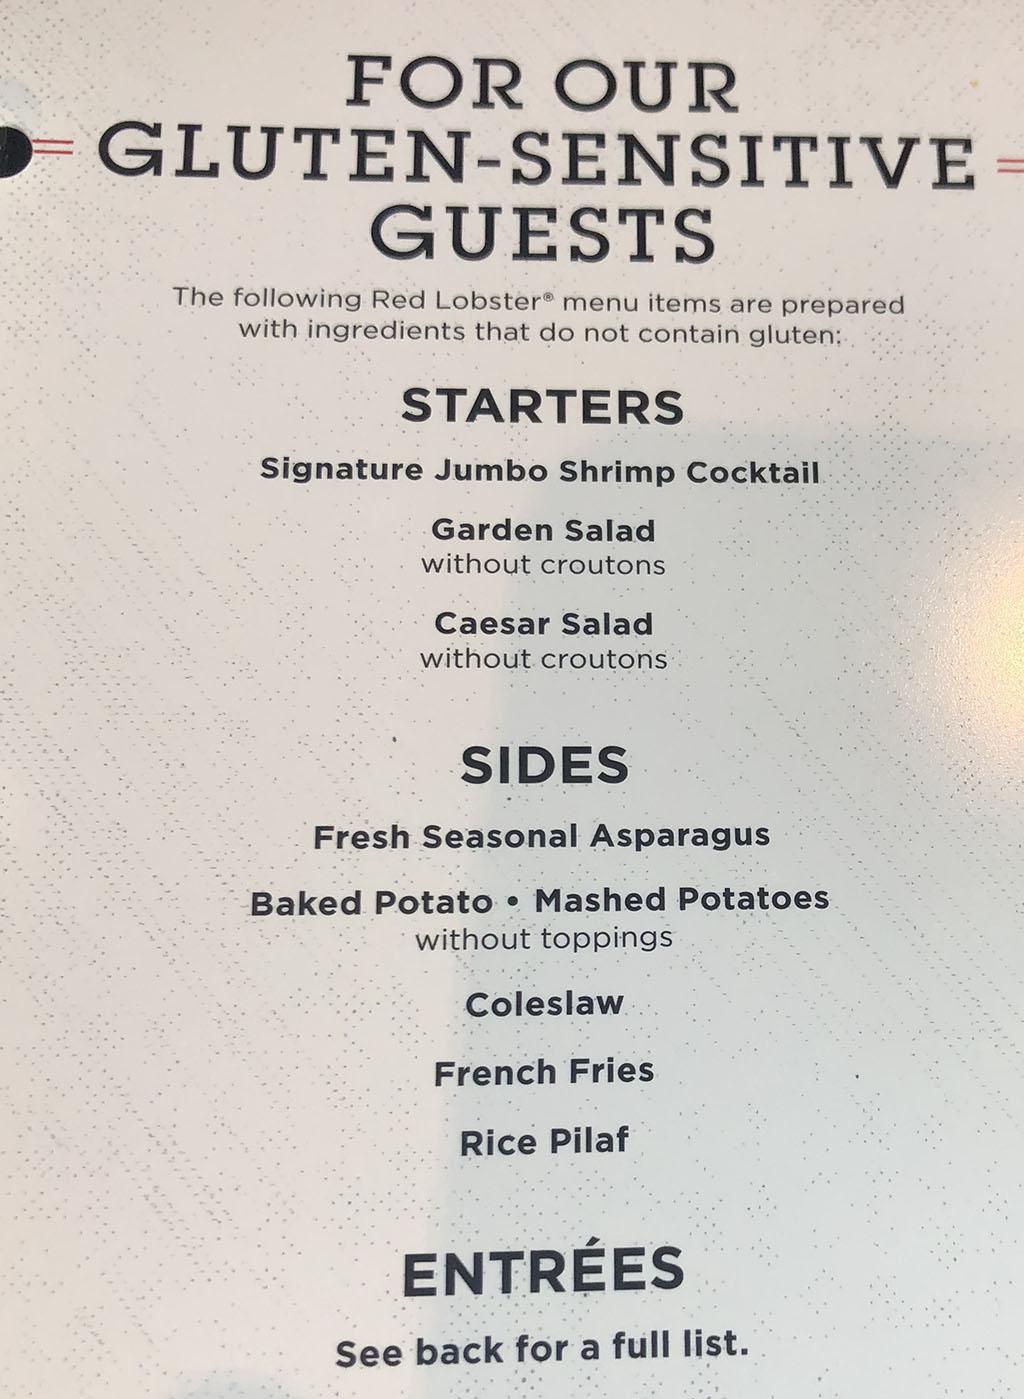 Red Lobster menu - gluten free options